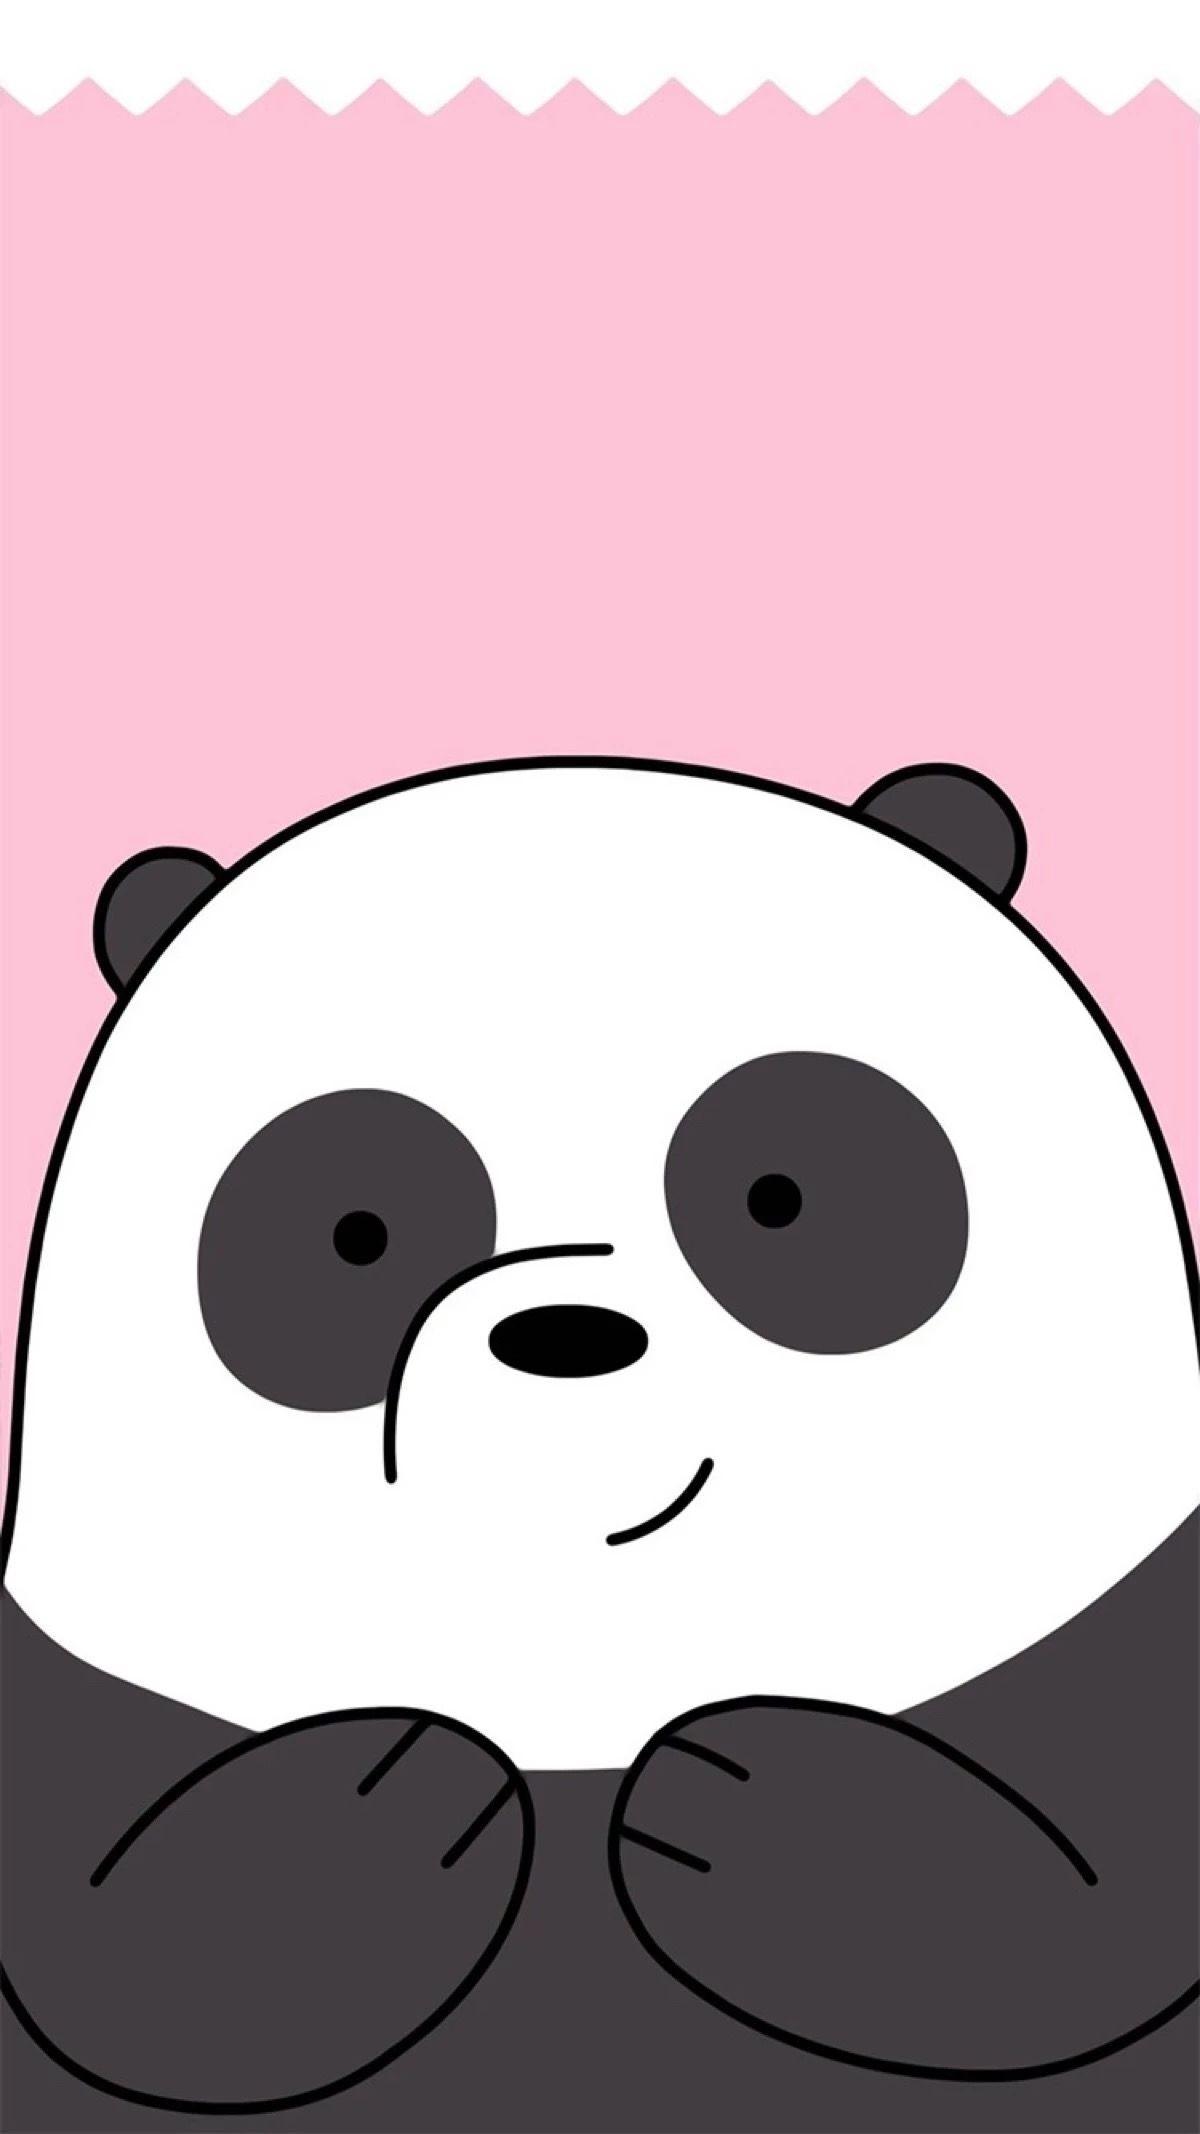 Res: 1200x2134, Best of Animated Panda iPhone Wallpaper Download - Cute Wallpapers Iphone  Wallpapers Album Bare Bears Animal